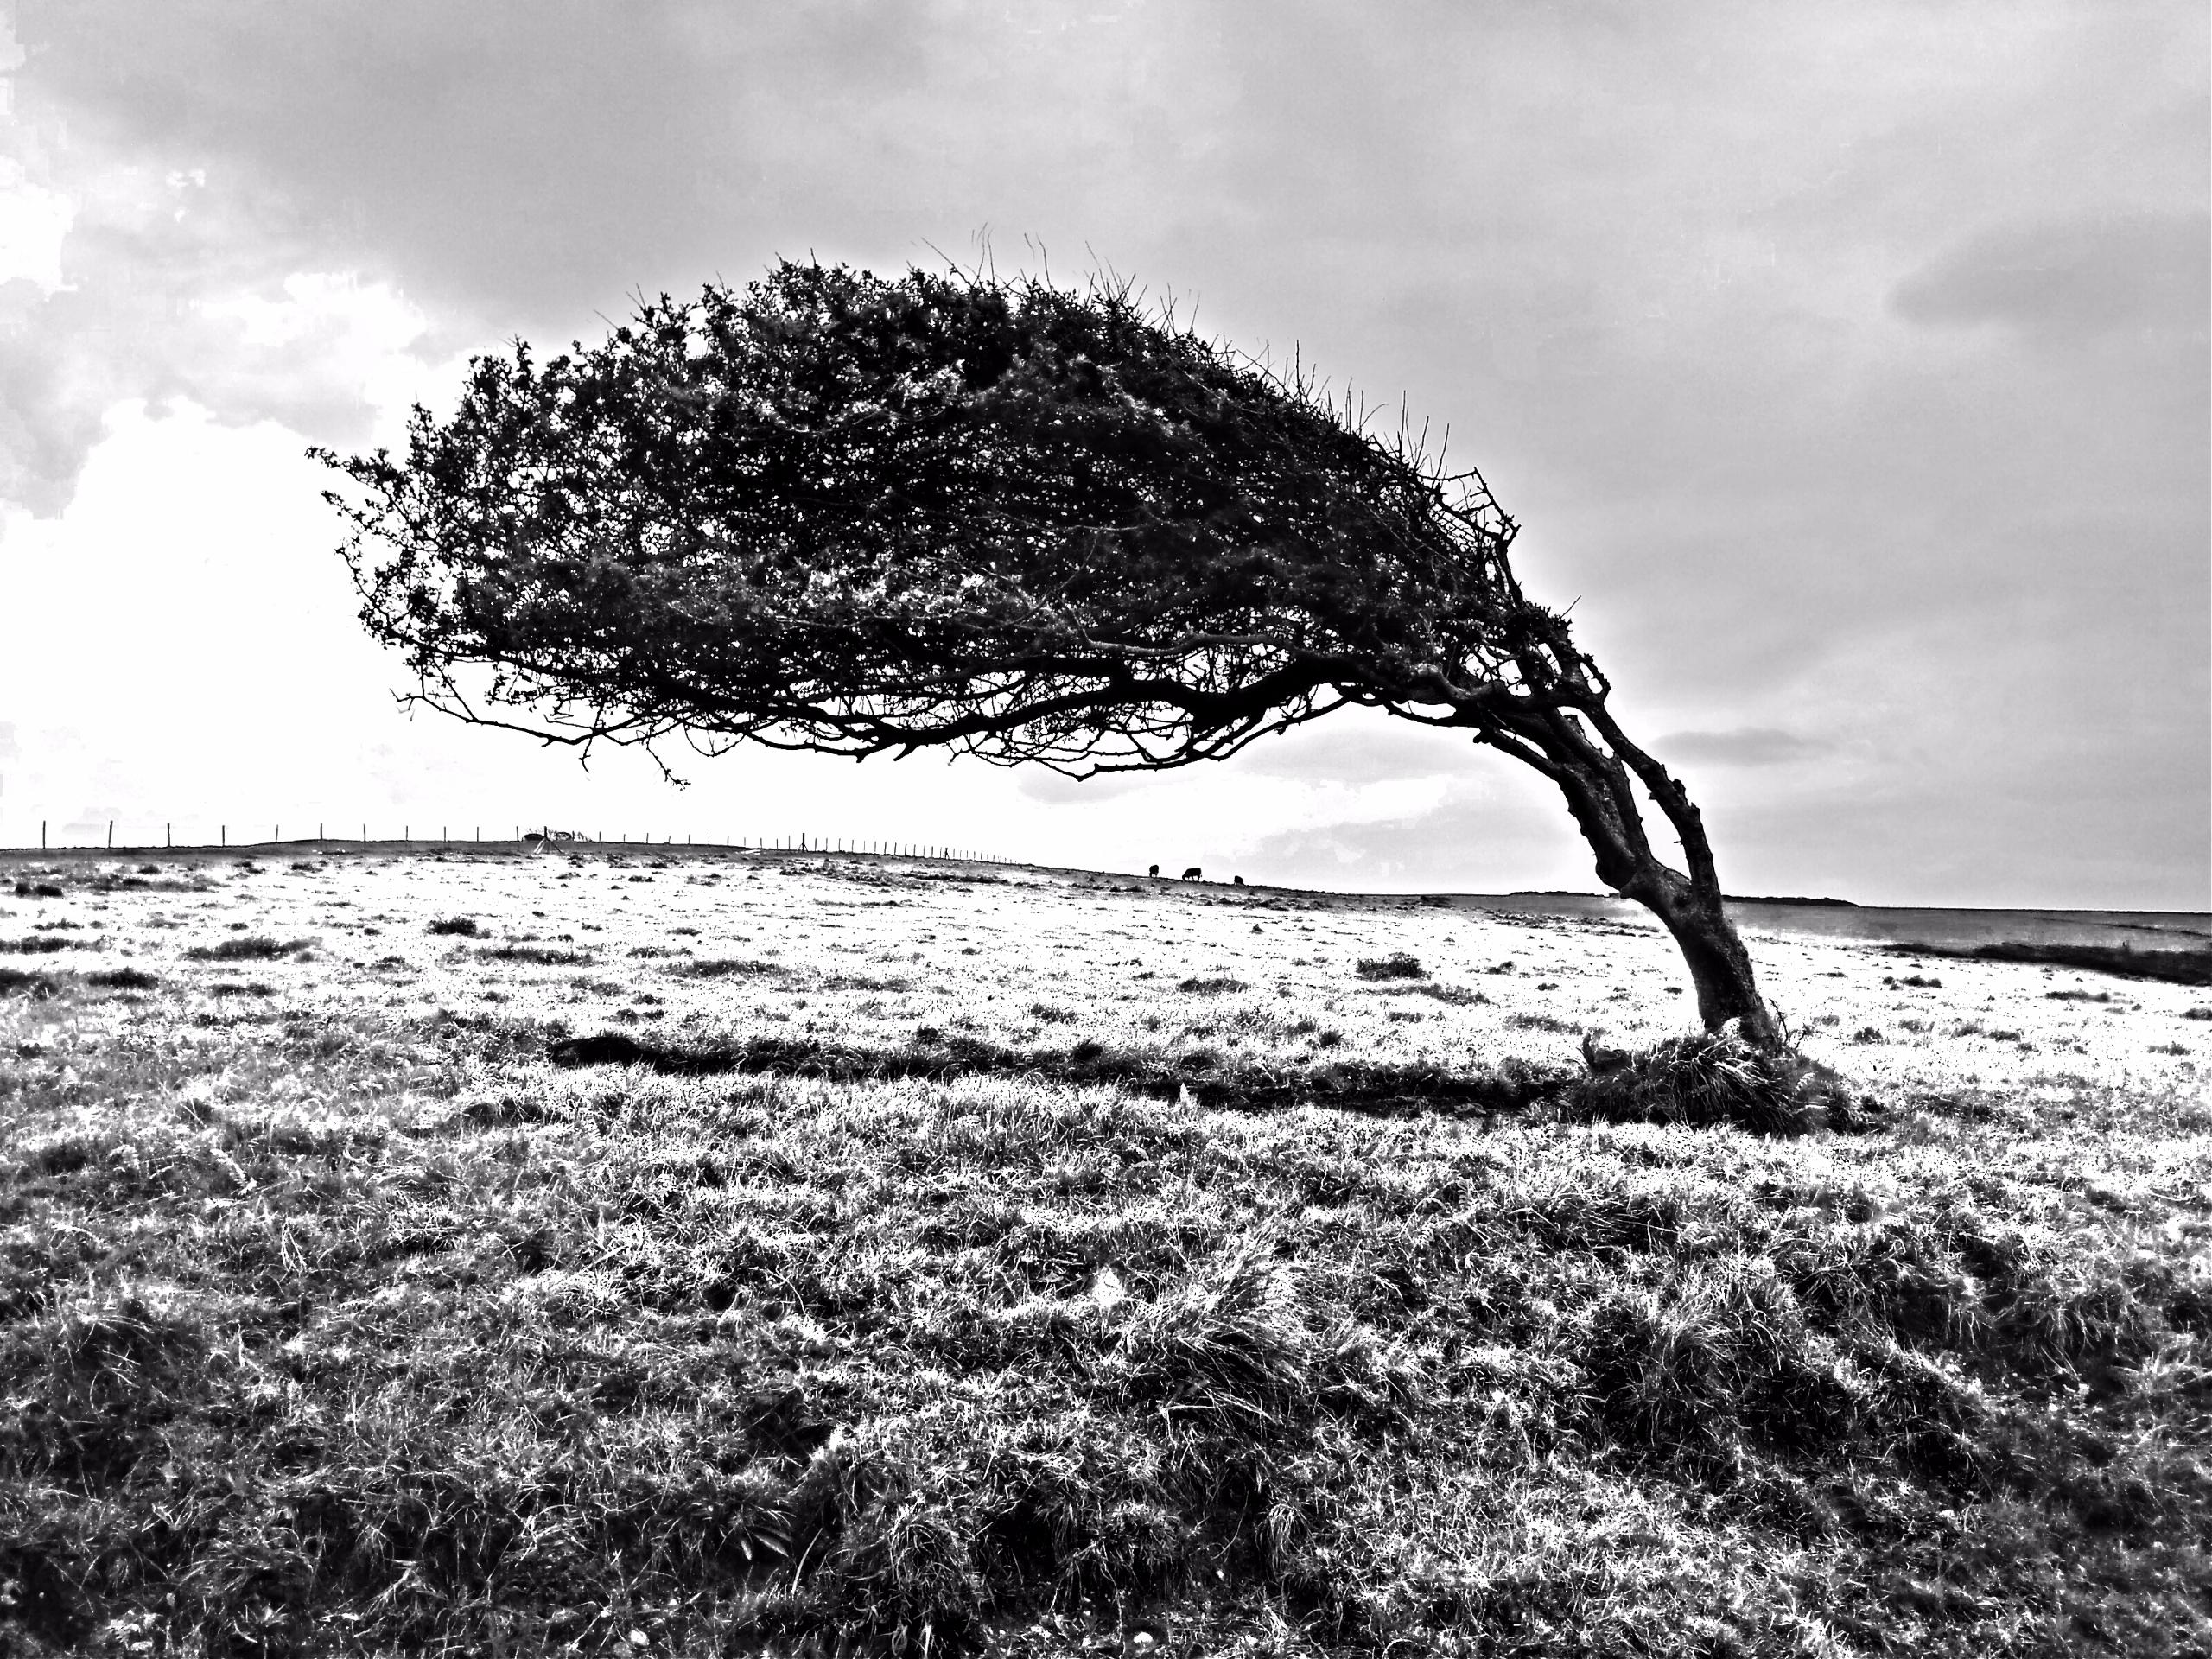 slightly surreal windblown tree - notabene | ello